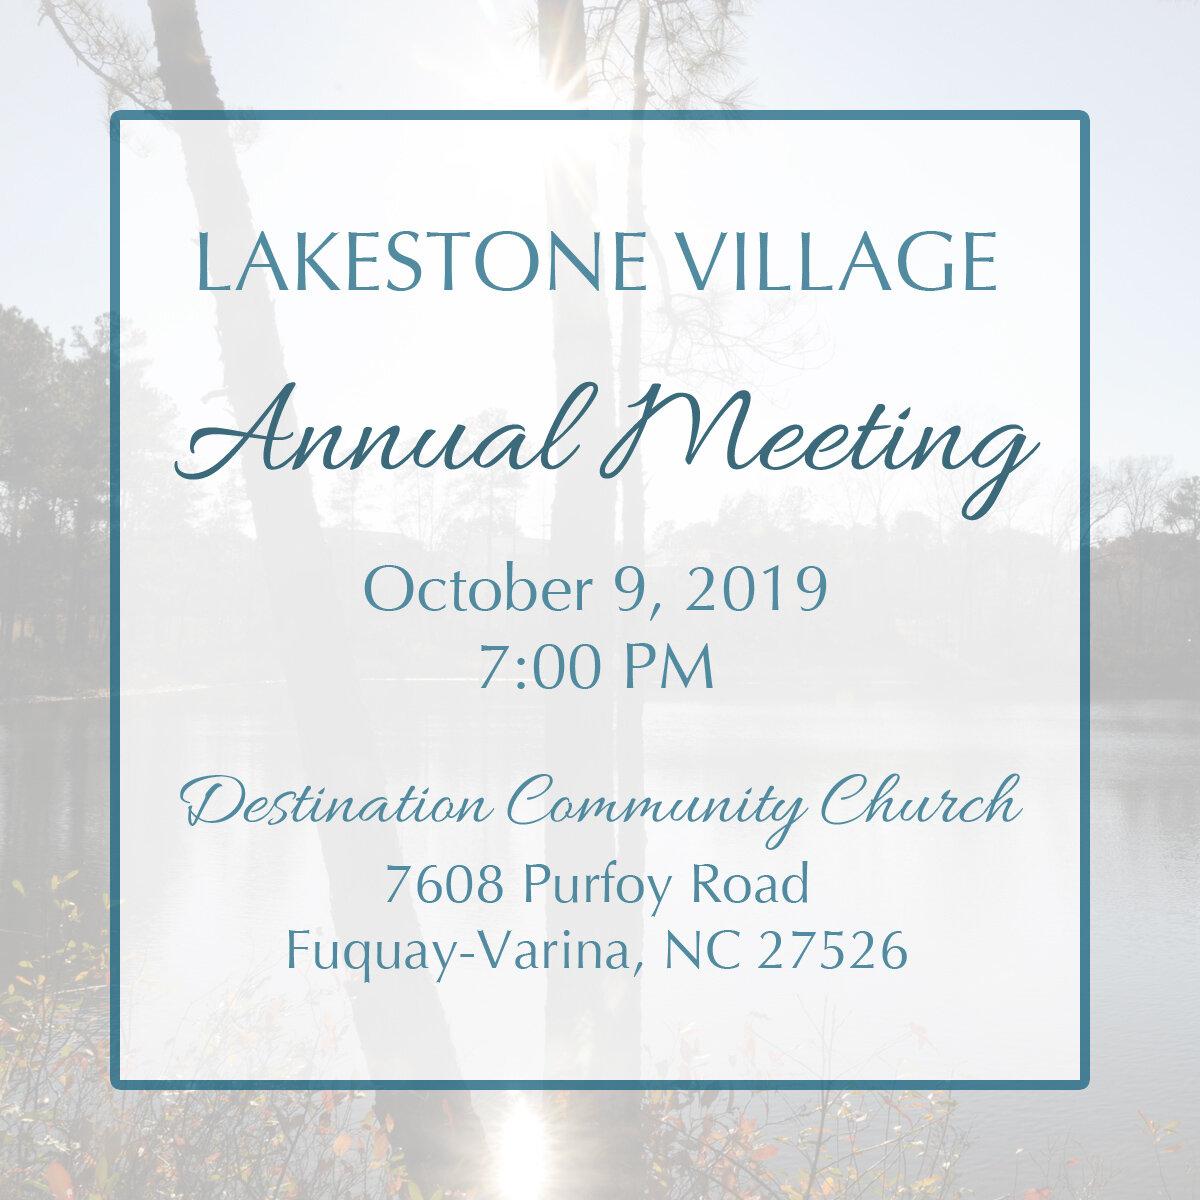 LV Annual Meeting 2019.jpg